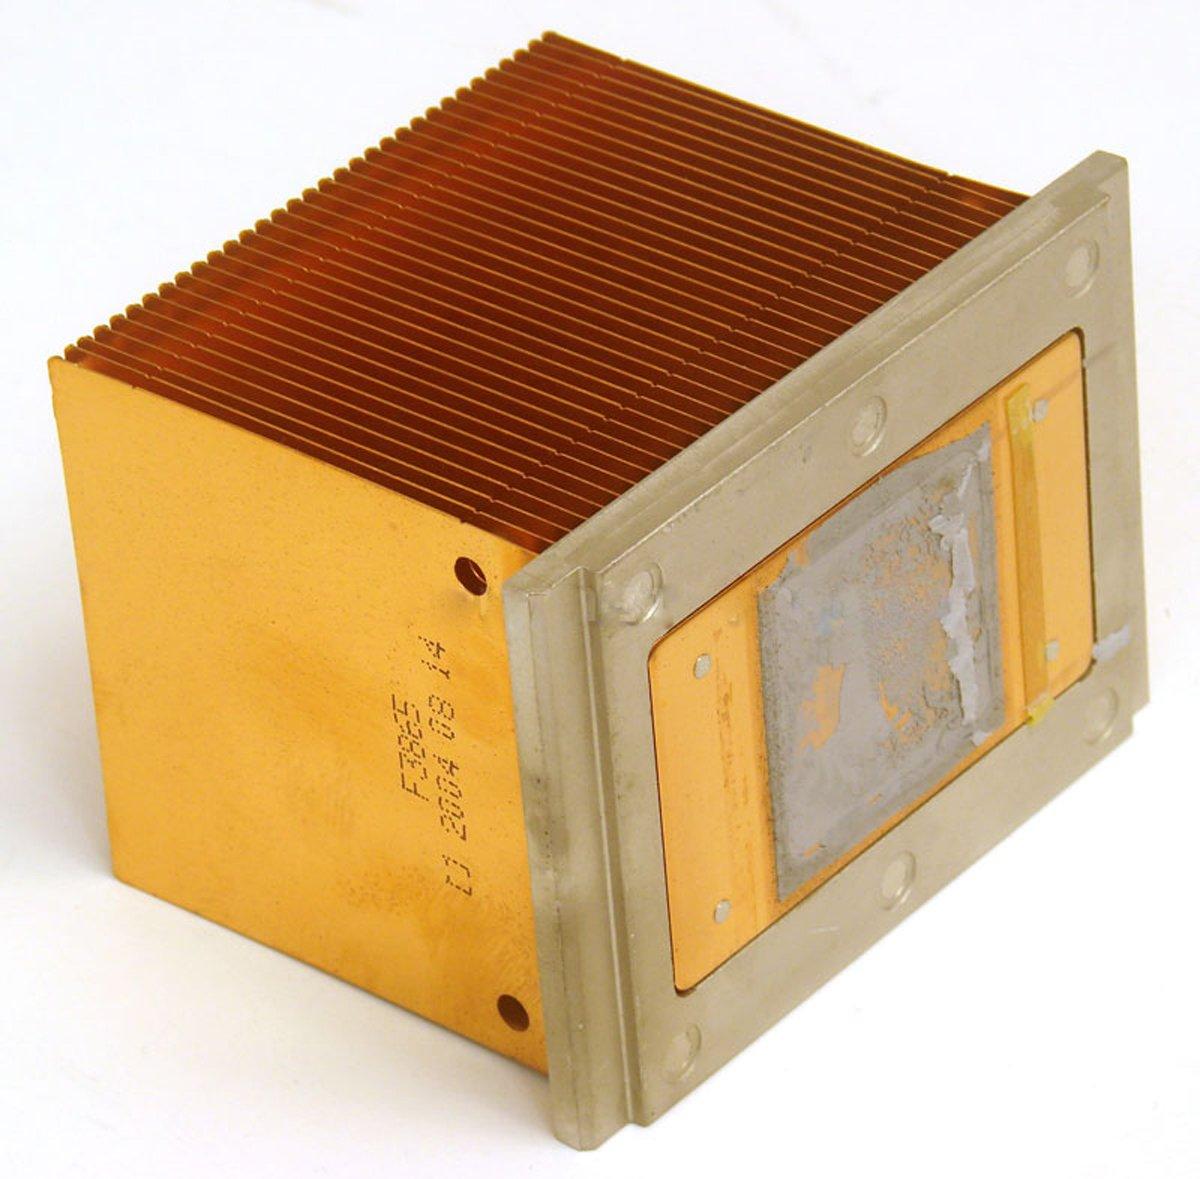 4700 Systems Compatible Part Numbers: F3865 H0632 4600 3000 Genuine Dell F3865 H0632 Desktop CPU Copper Heatsink For Optiplex GX170L Dimension 2400